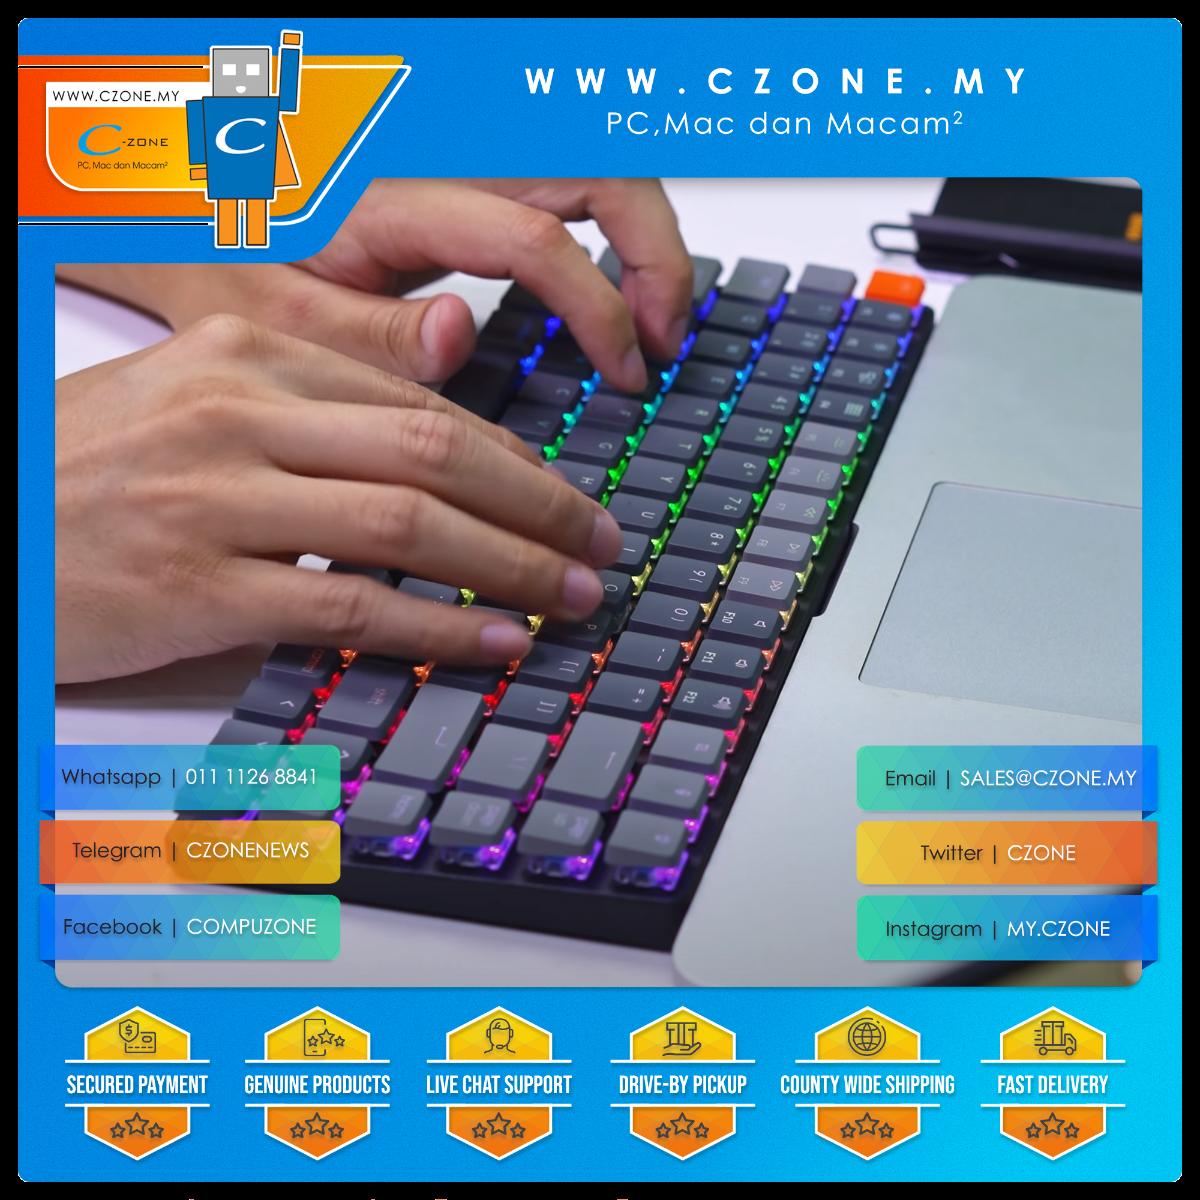 https://czone.my/czone/accessories/keyboards.html?brand=9420